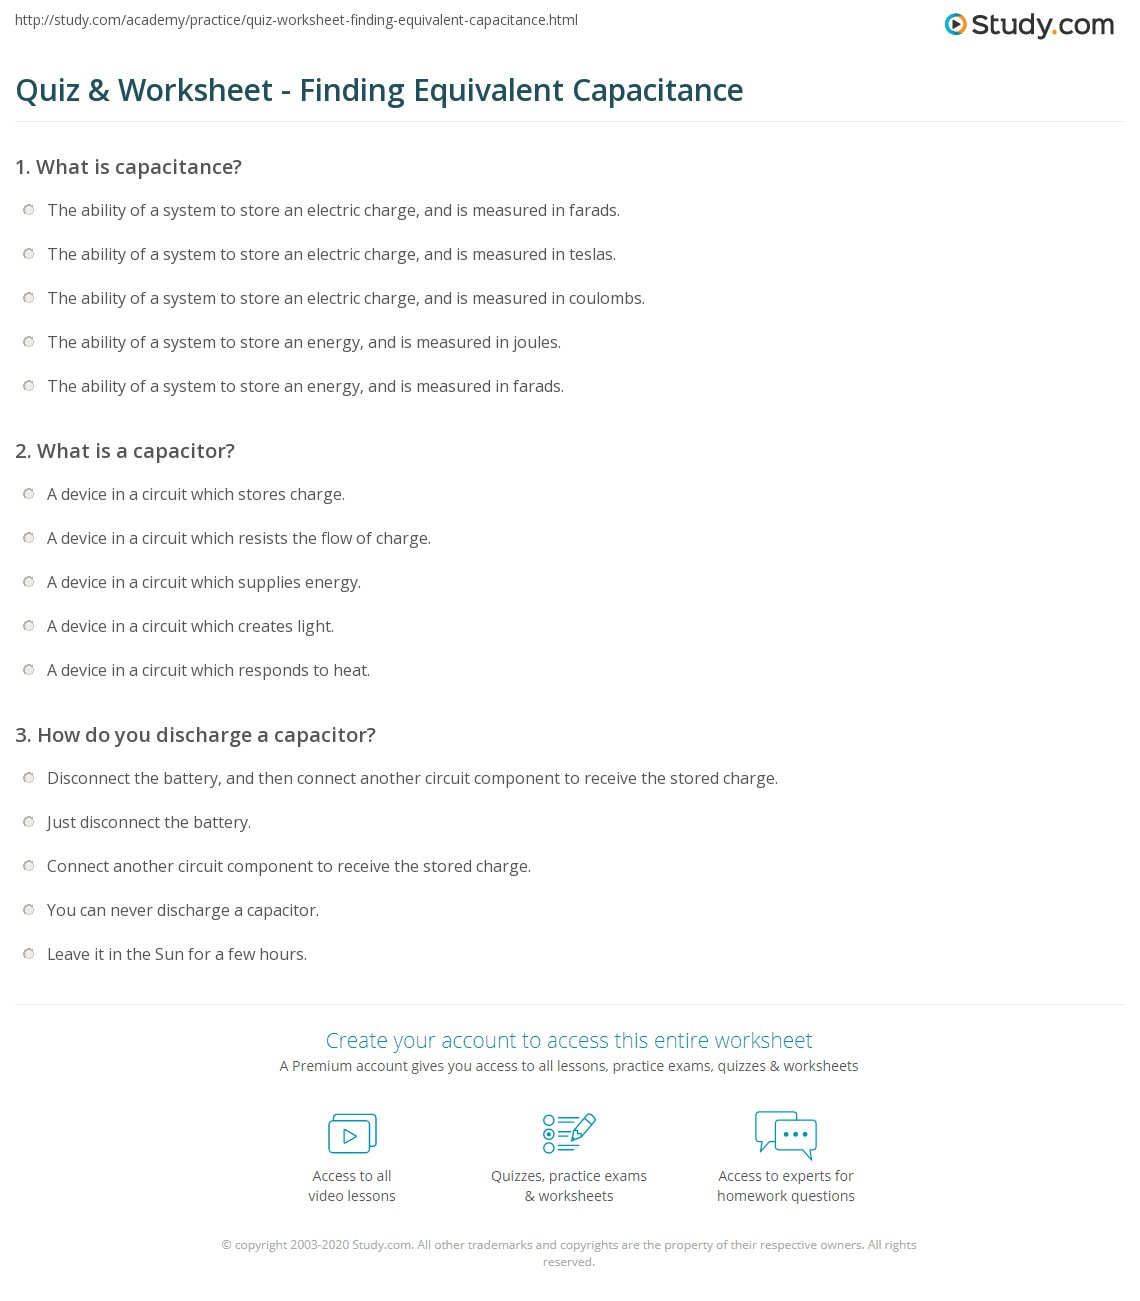 Quiz Worksheet Finding Equivalent Capacitance Studycom